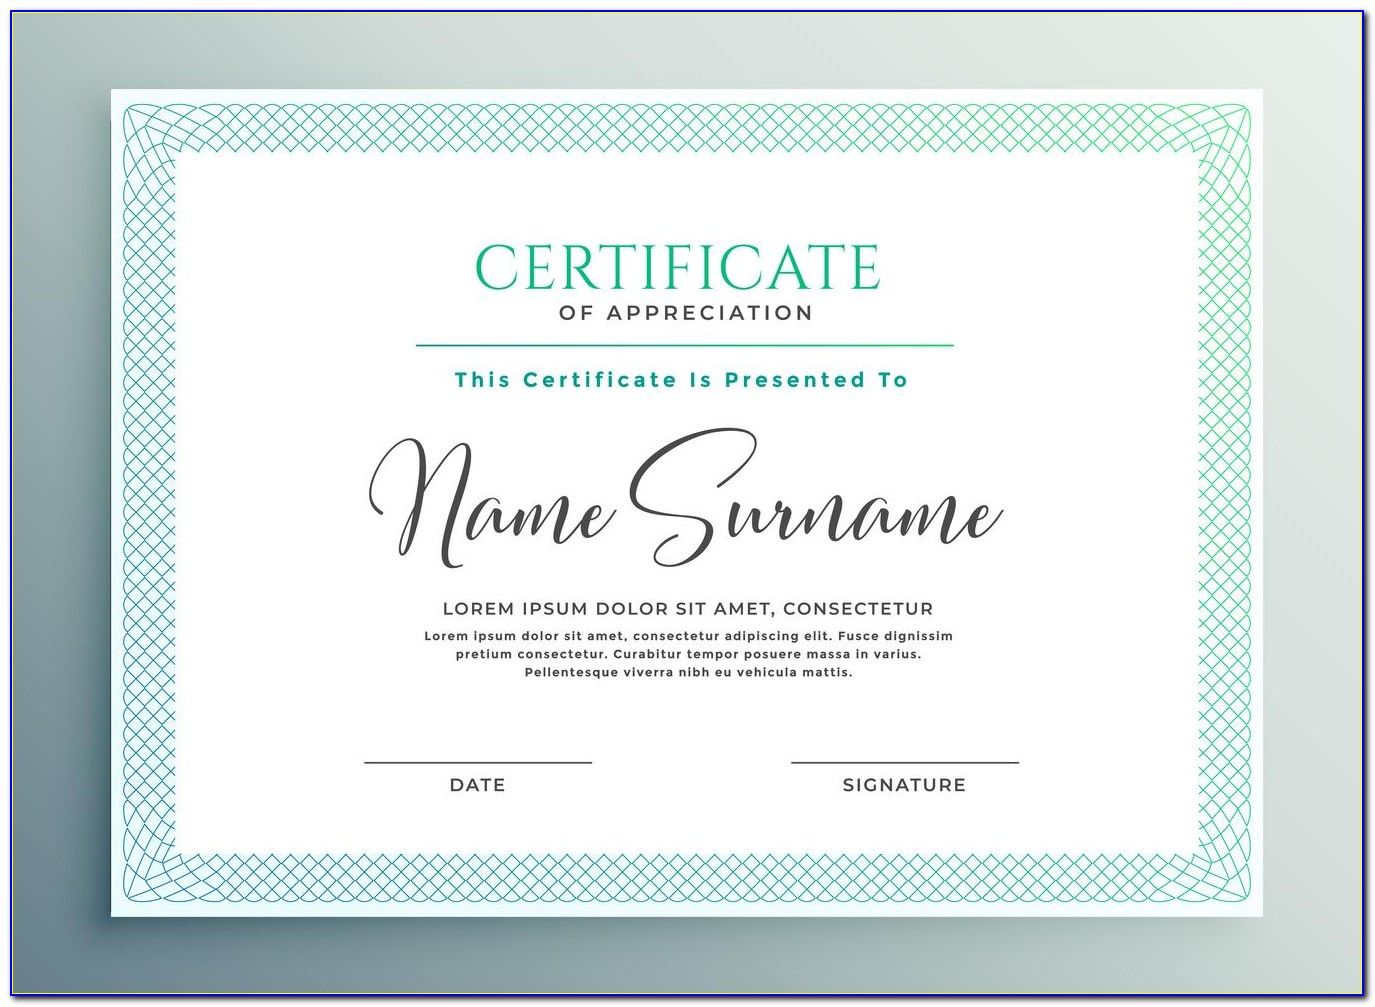 Certificate Of Appreciation Samples